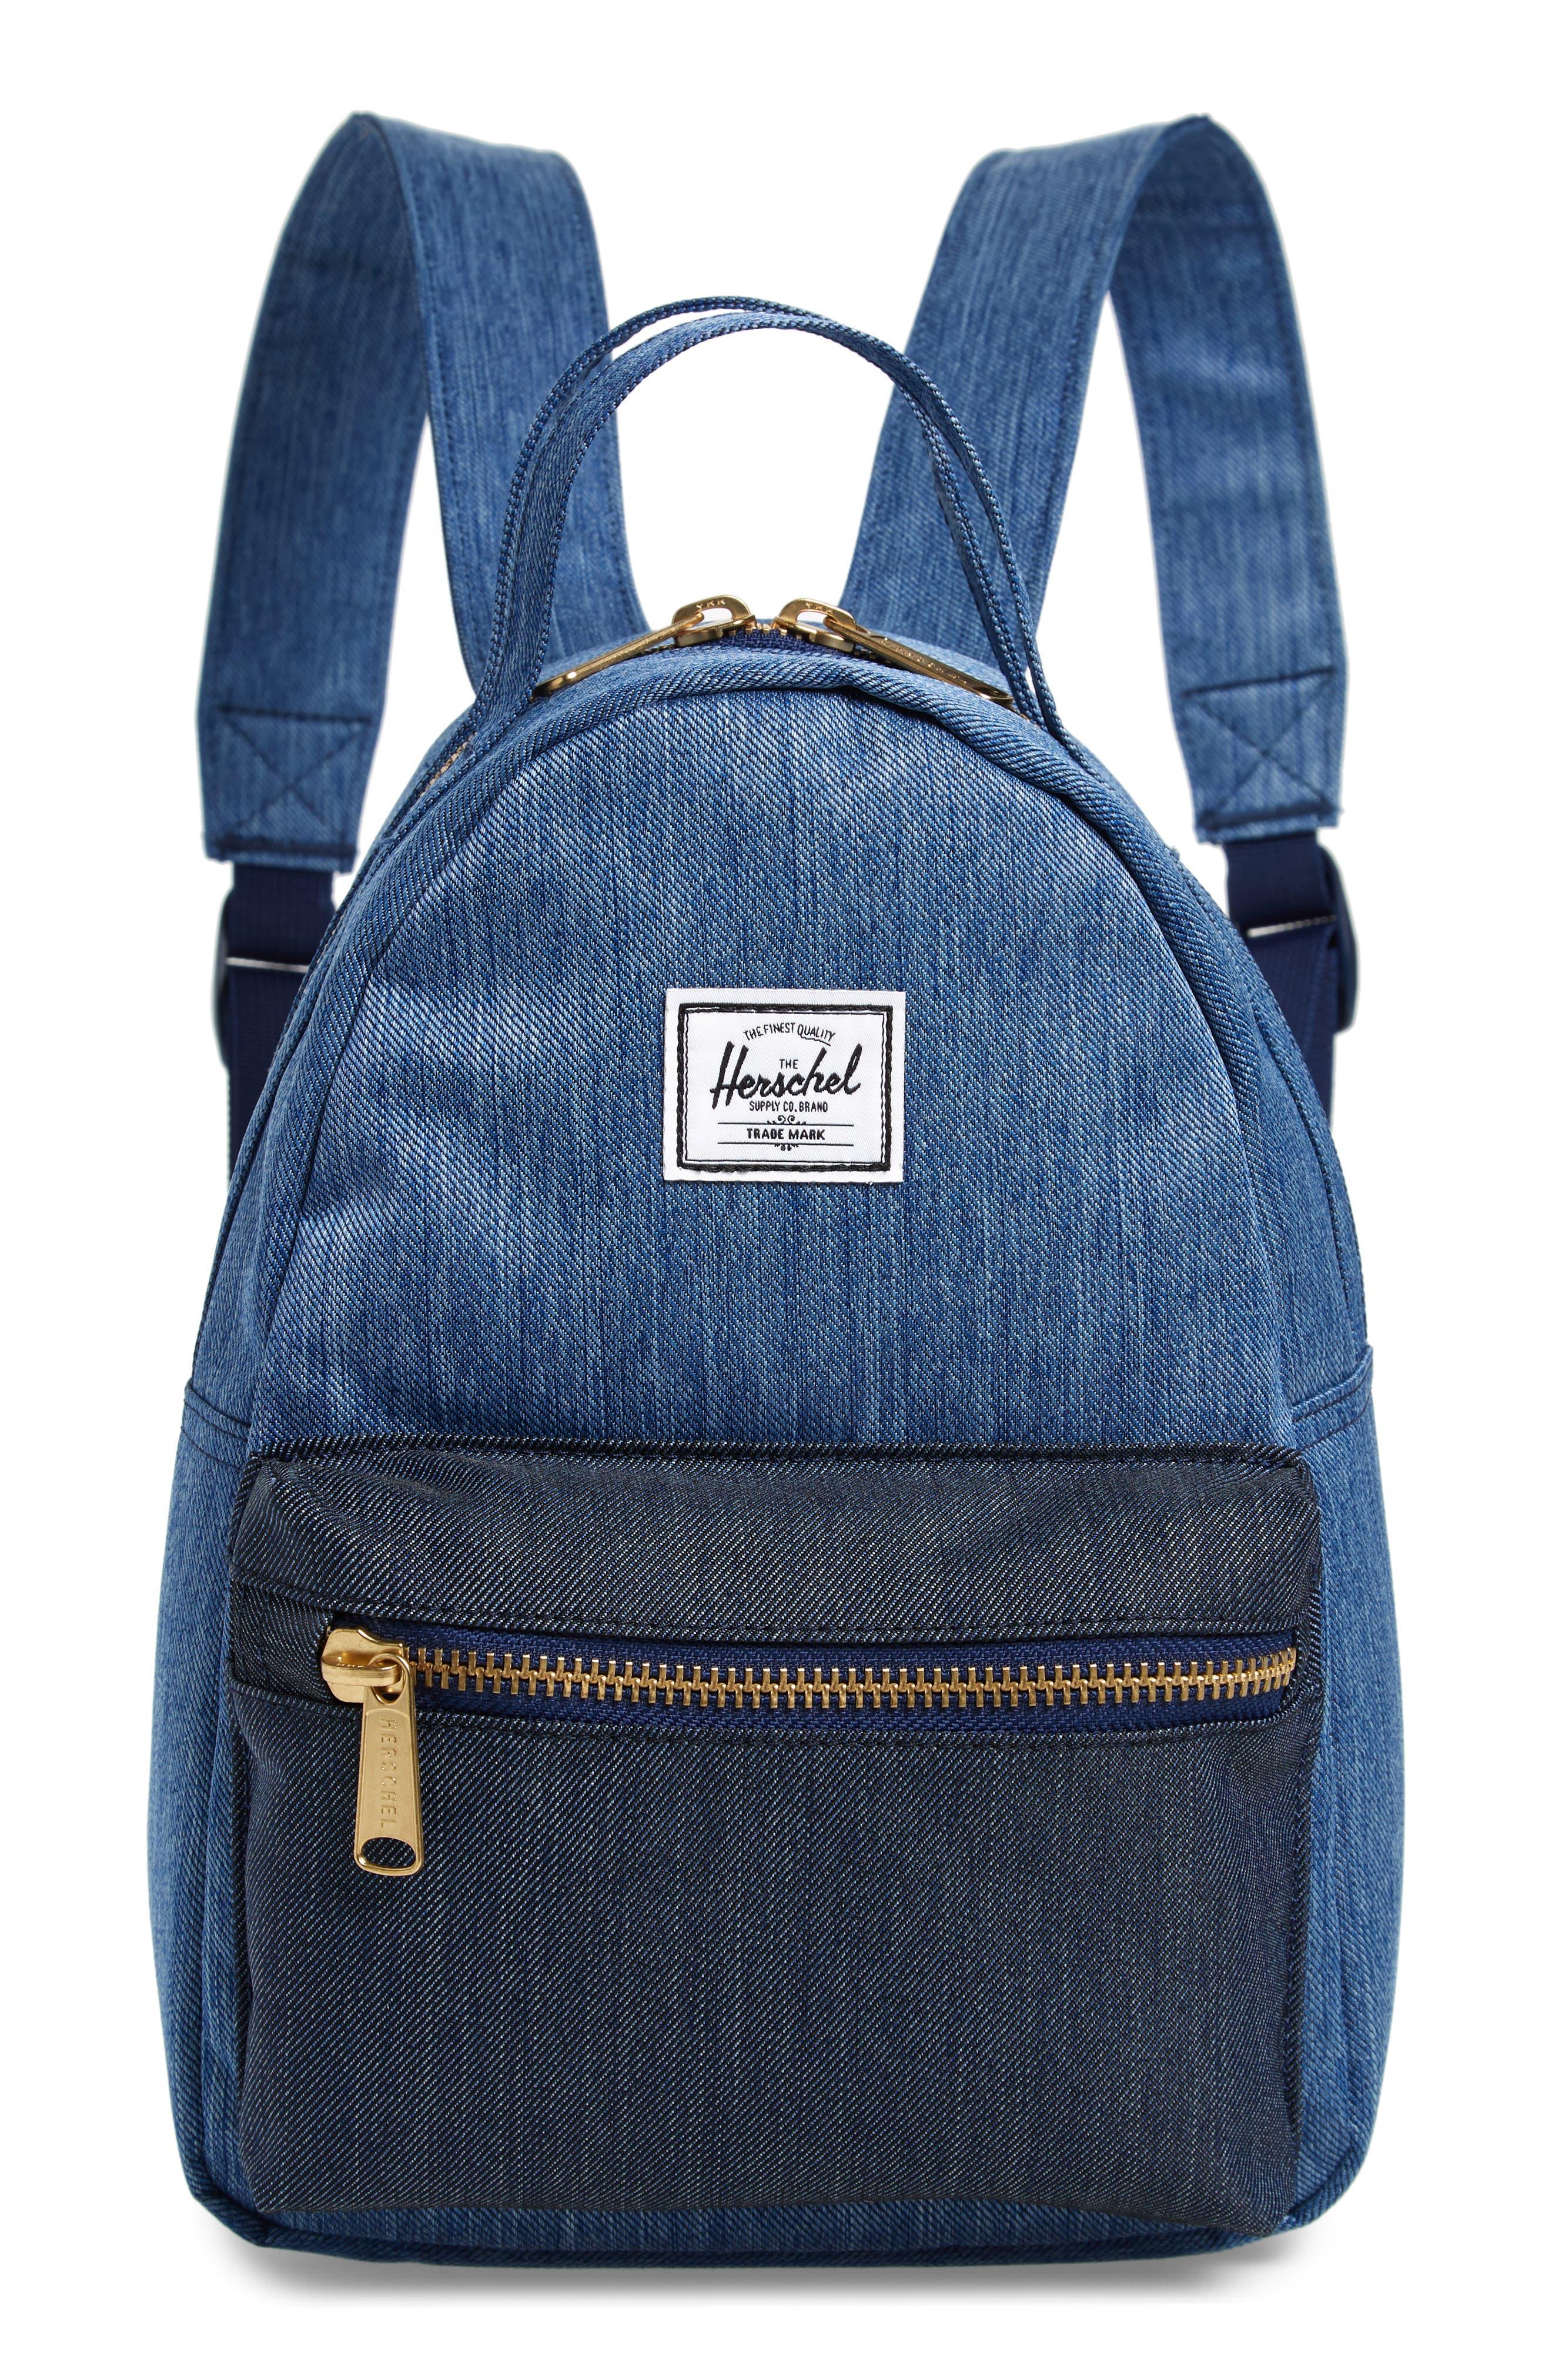 Herschel Supply Co. Mini Nova Backpack - Blue